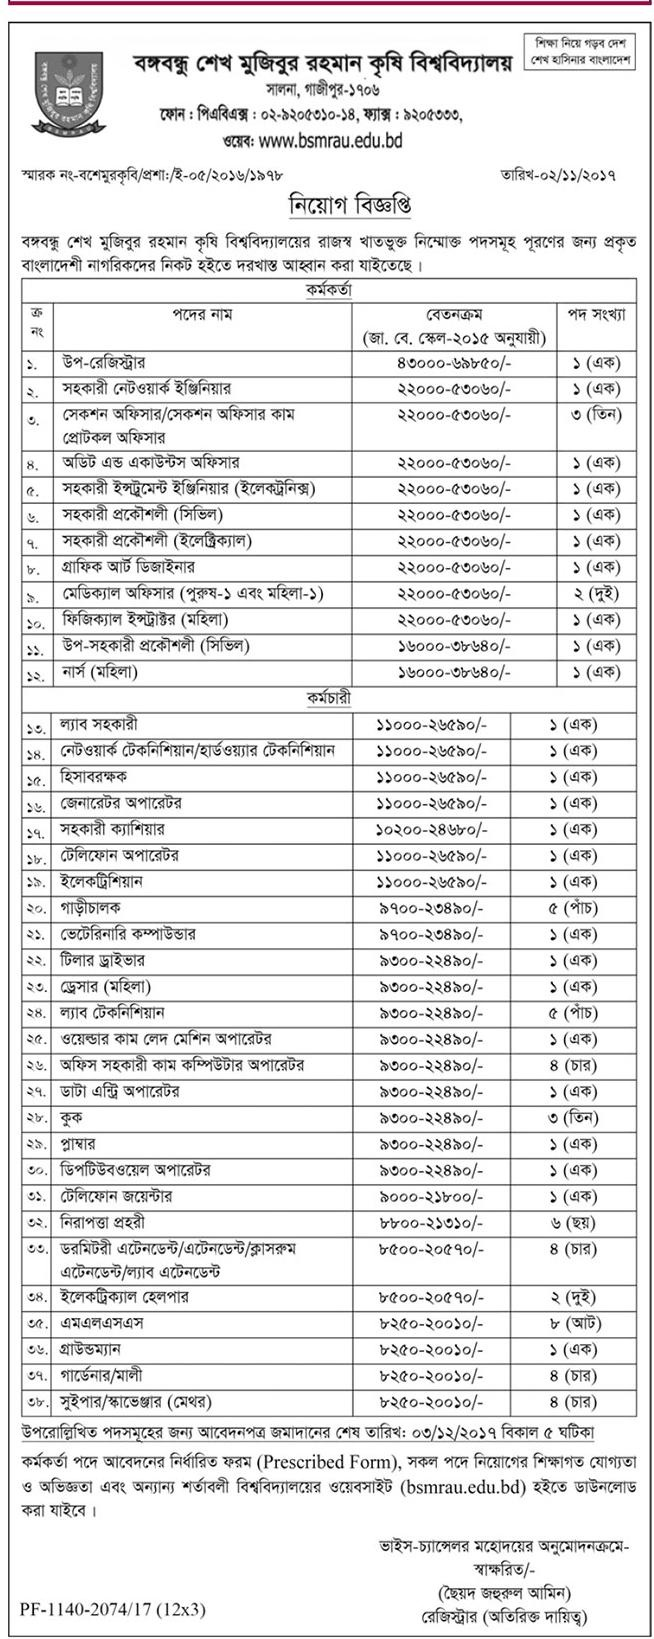 Bangabandhu Sheikh Mujibur Rahman Agricultural University Job Circular 2017